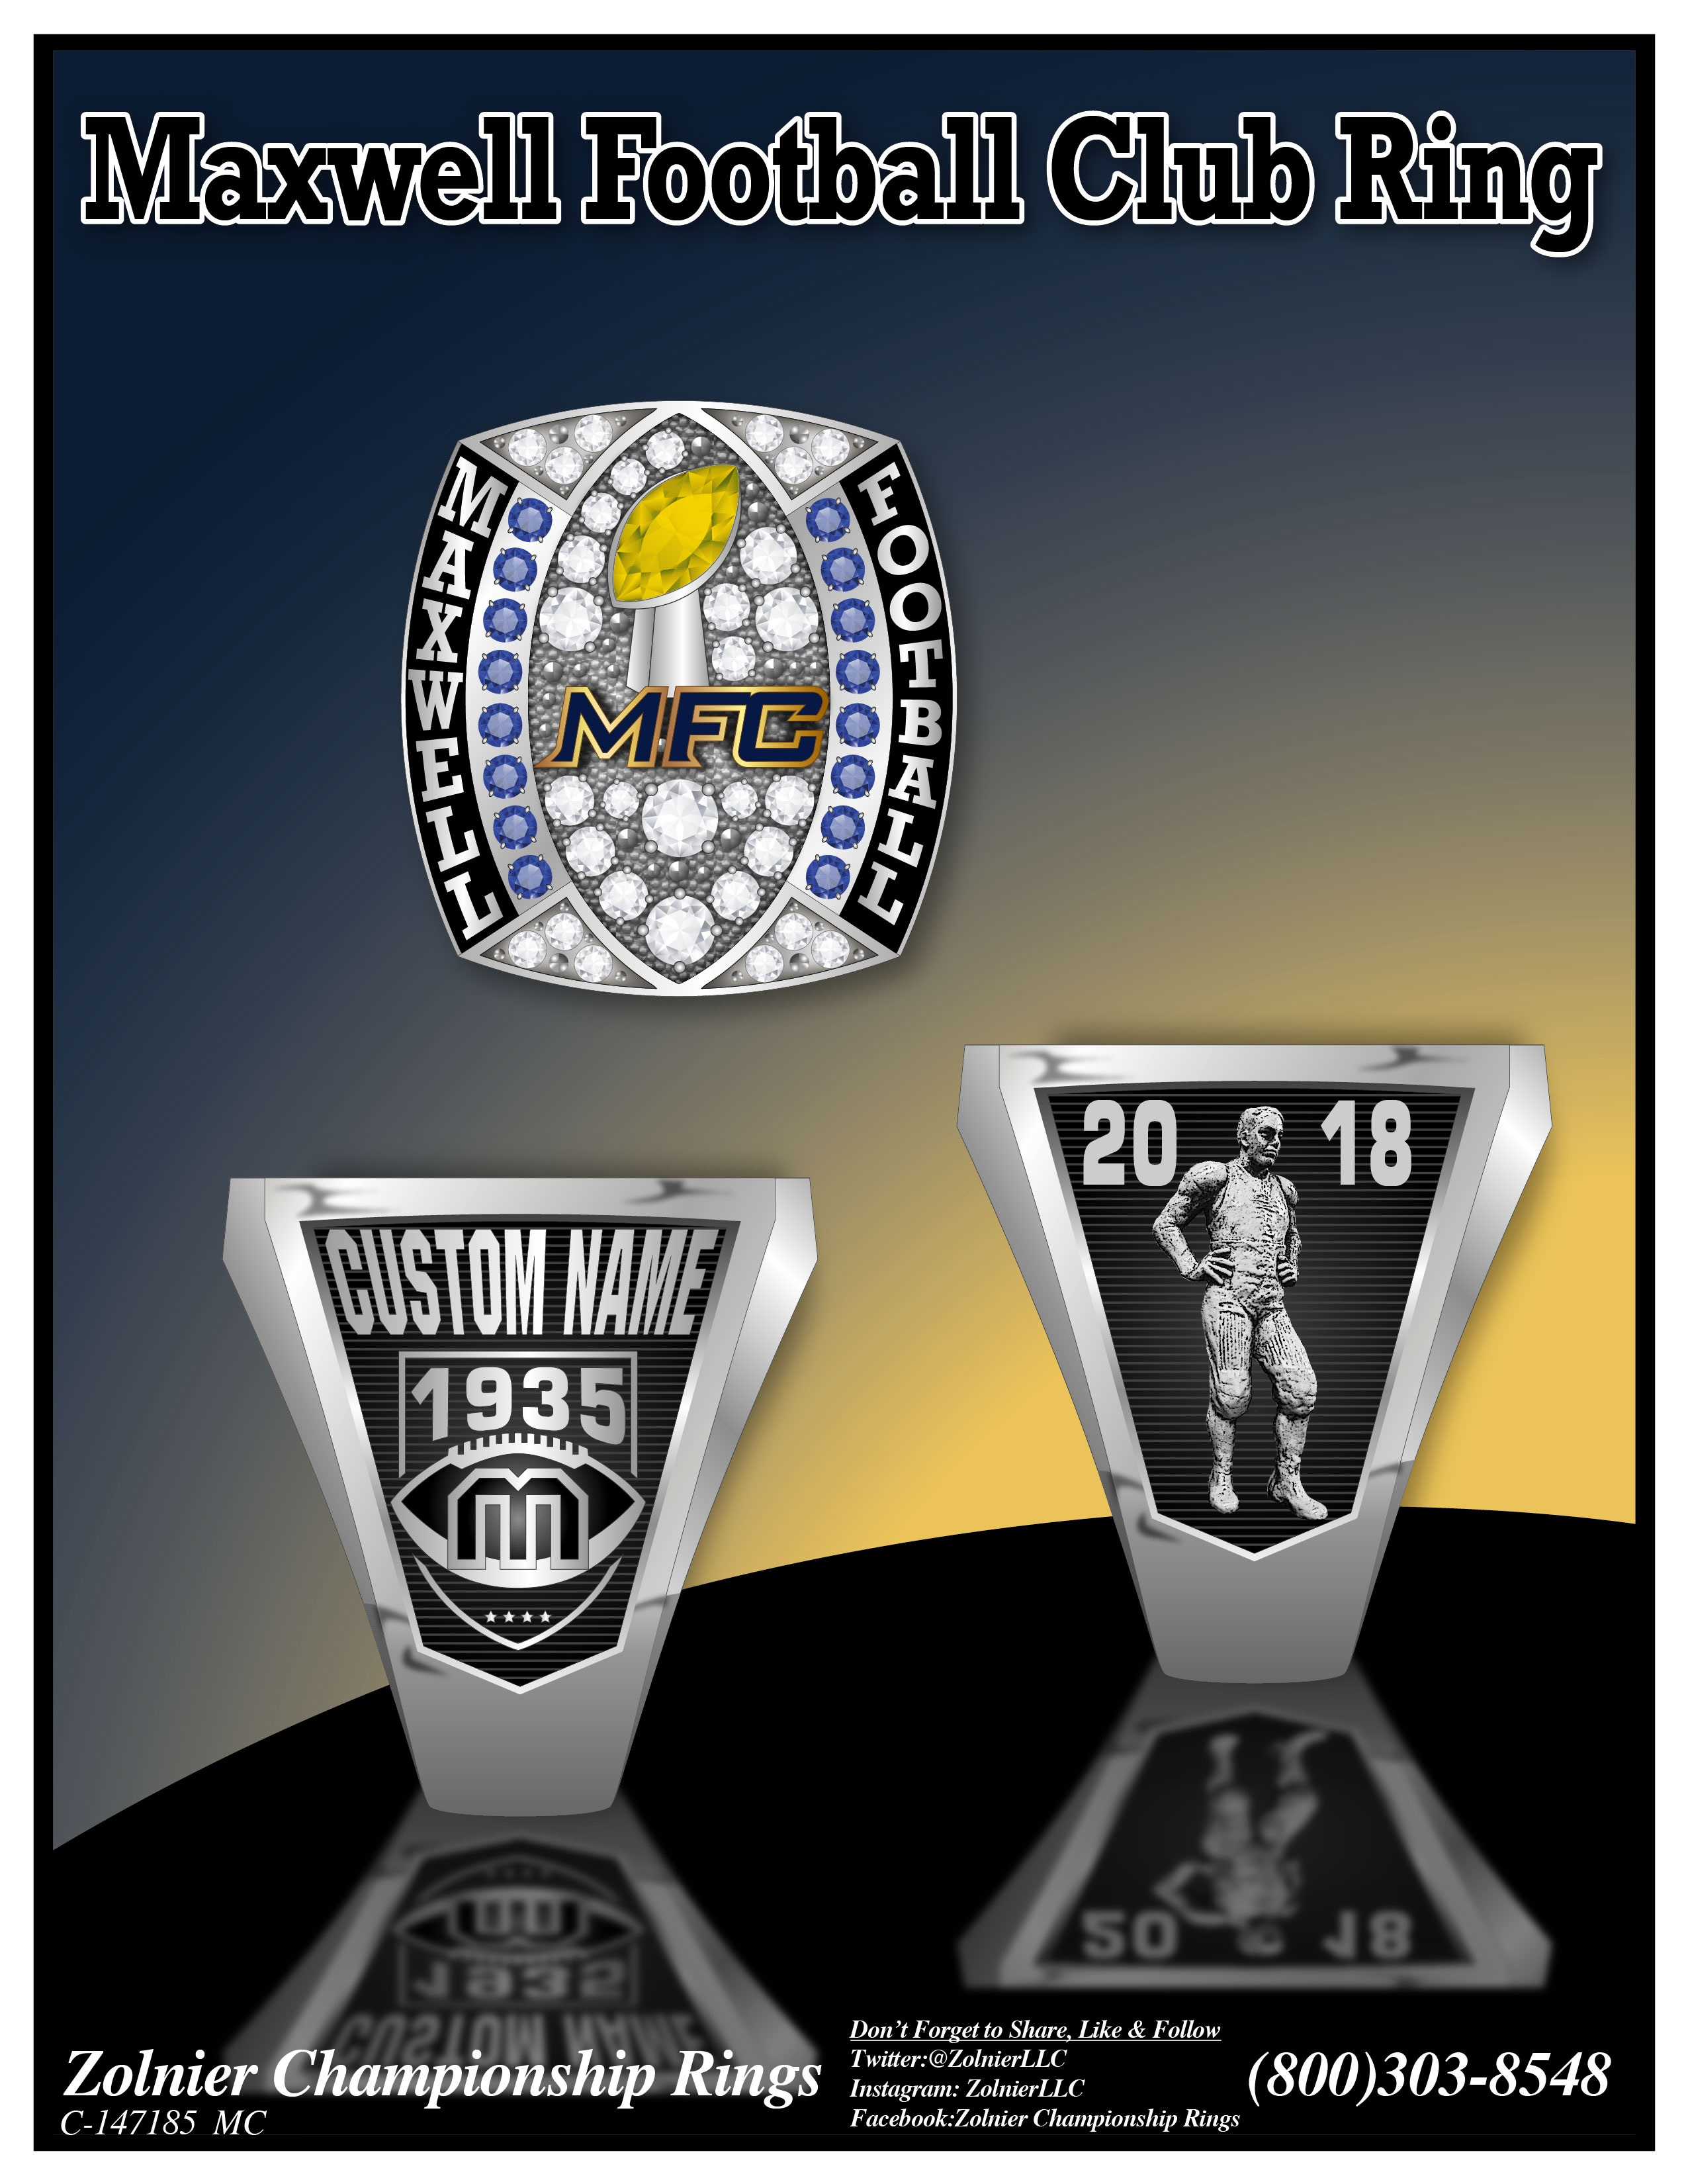 C-147185 Maxwell Football Club Champ Ring - Copy